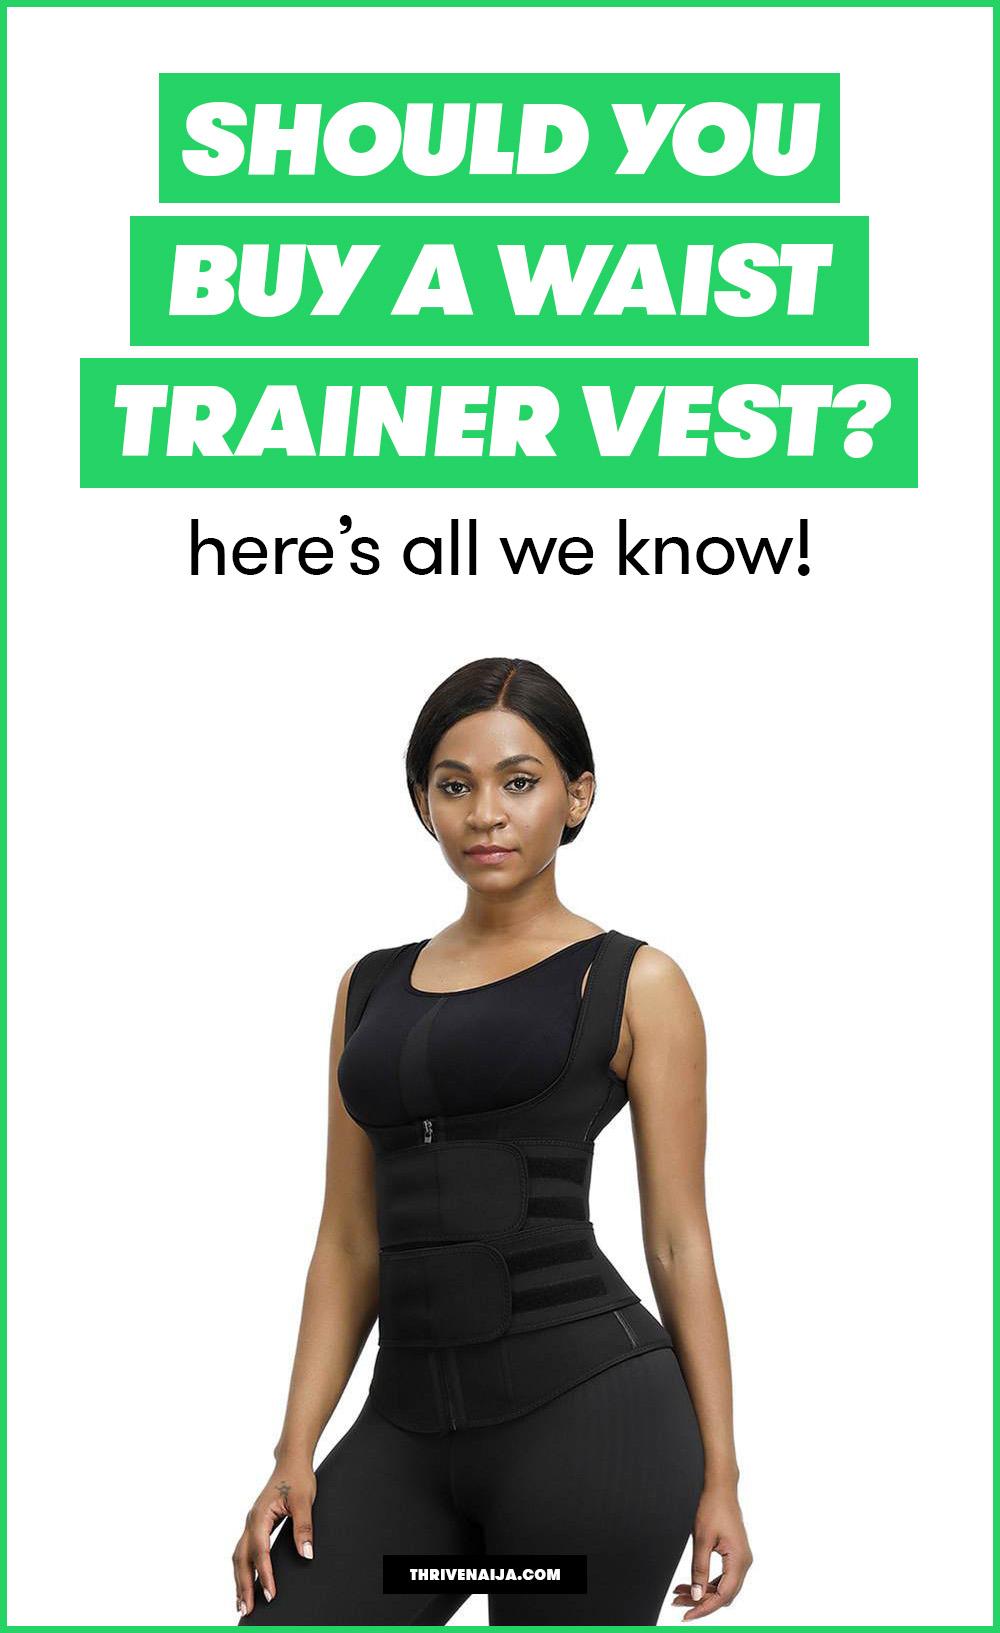 Should you buy a waist trainer vest?